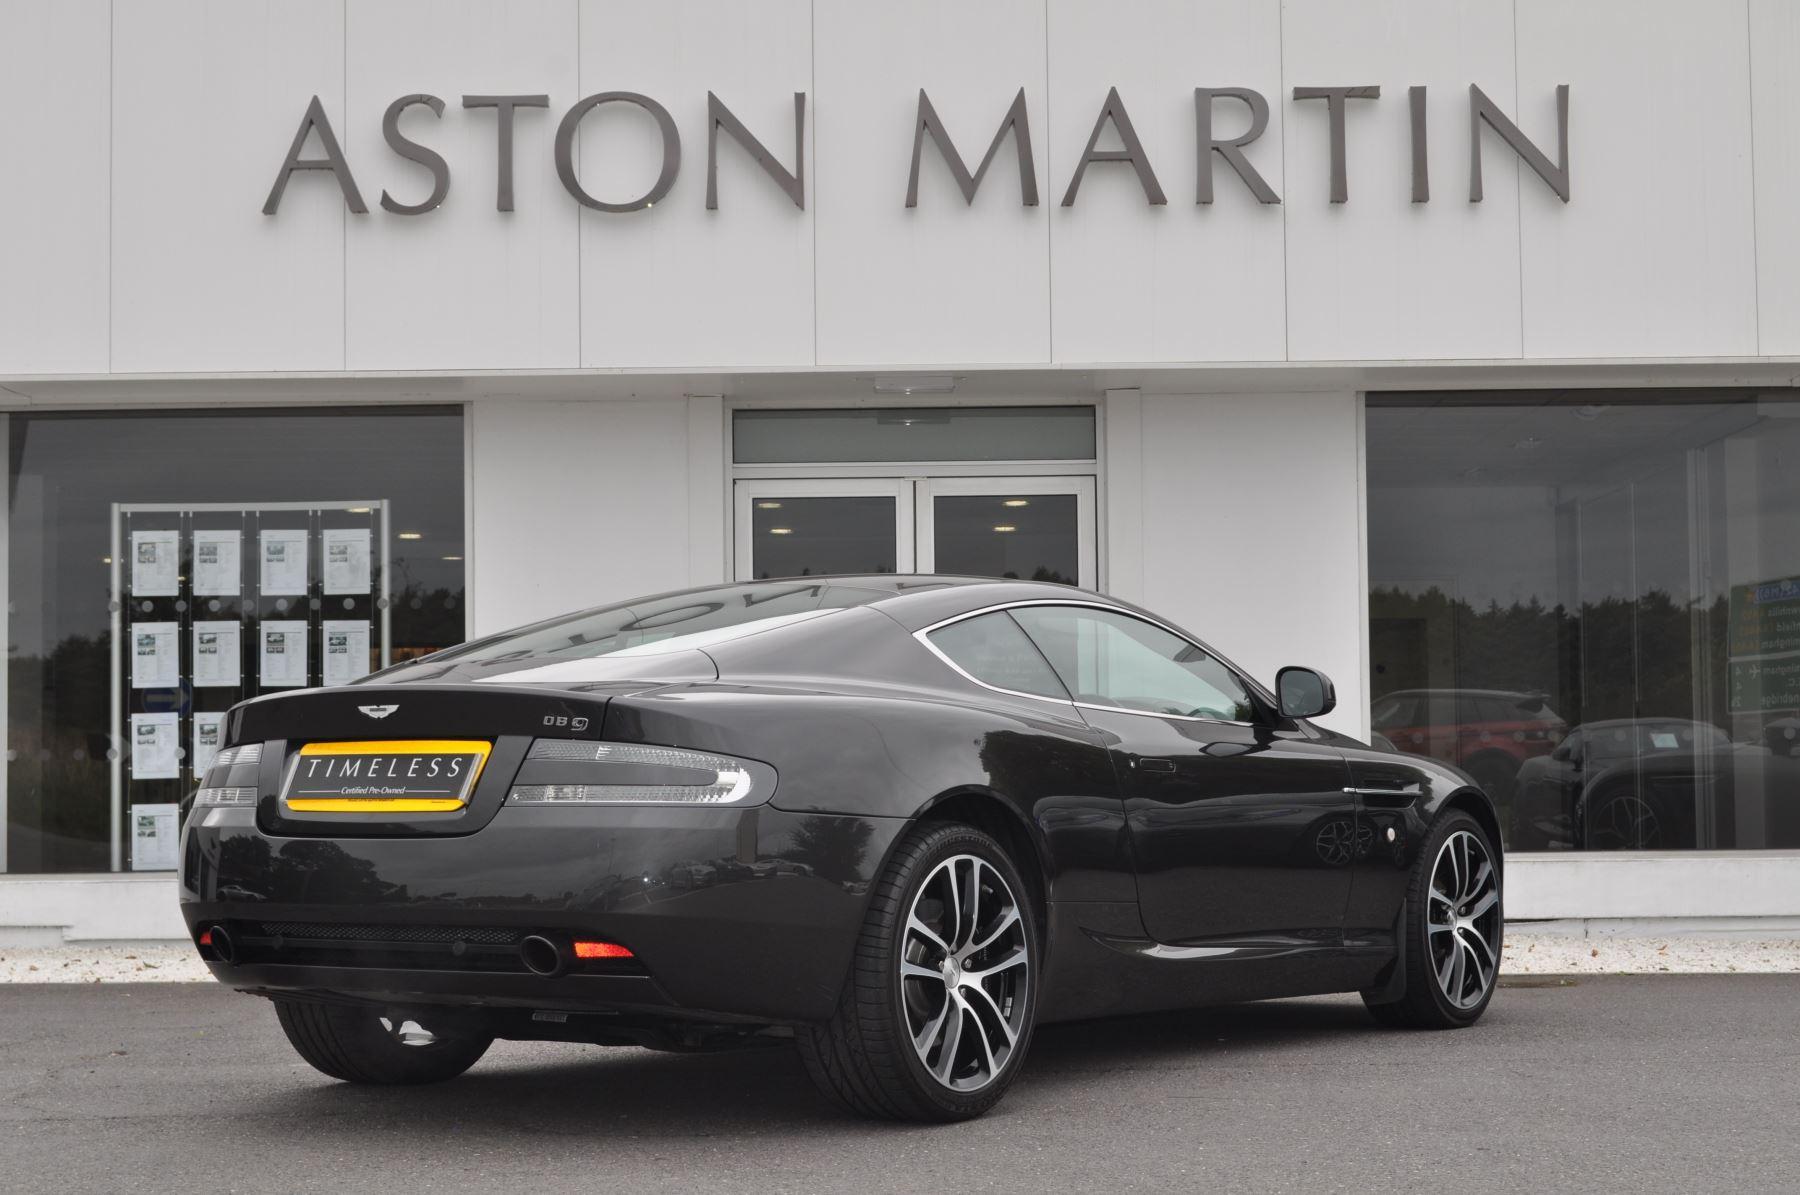 Aston Martin DB V Dr Touchtronic LE Sport Automatic - Db 9 aston martin